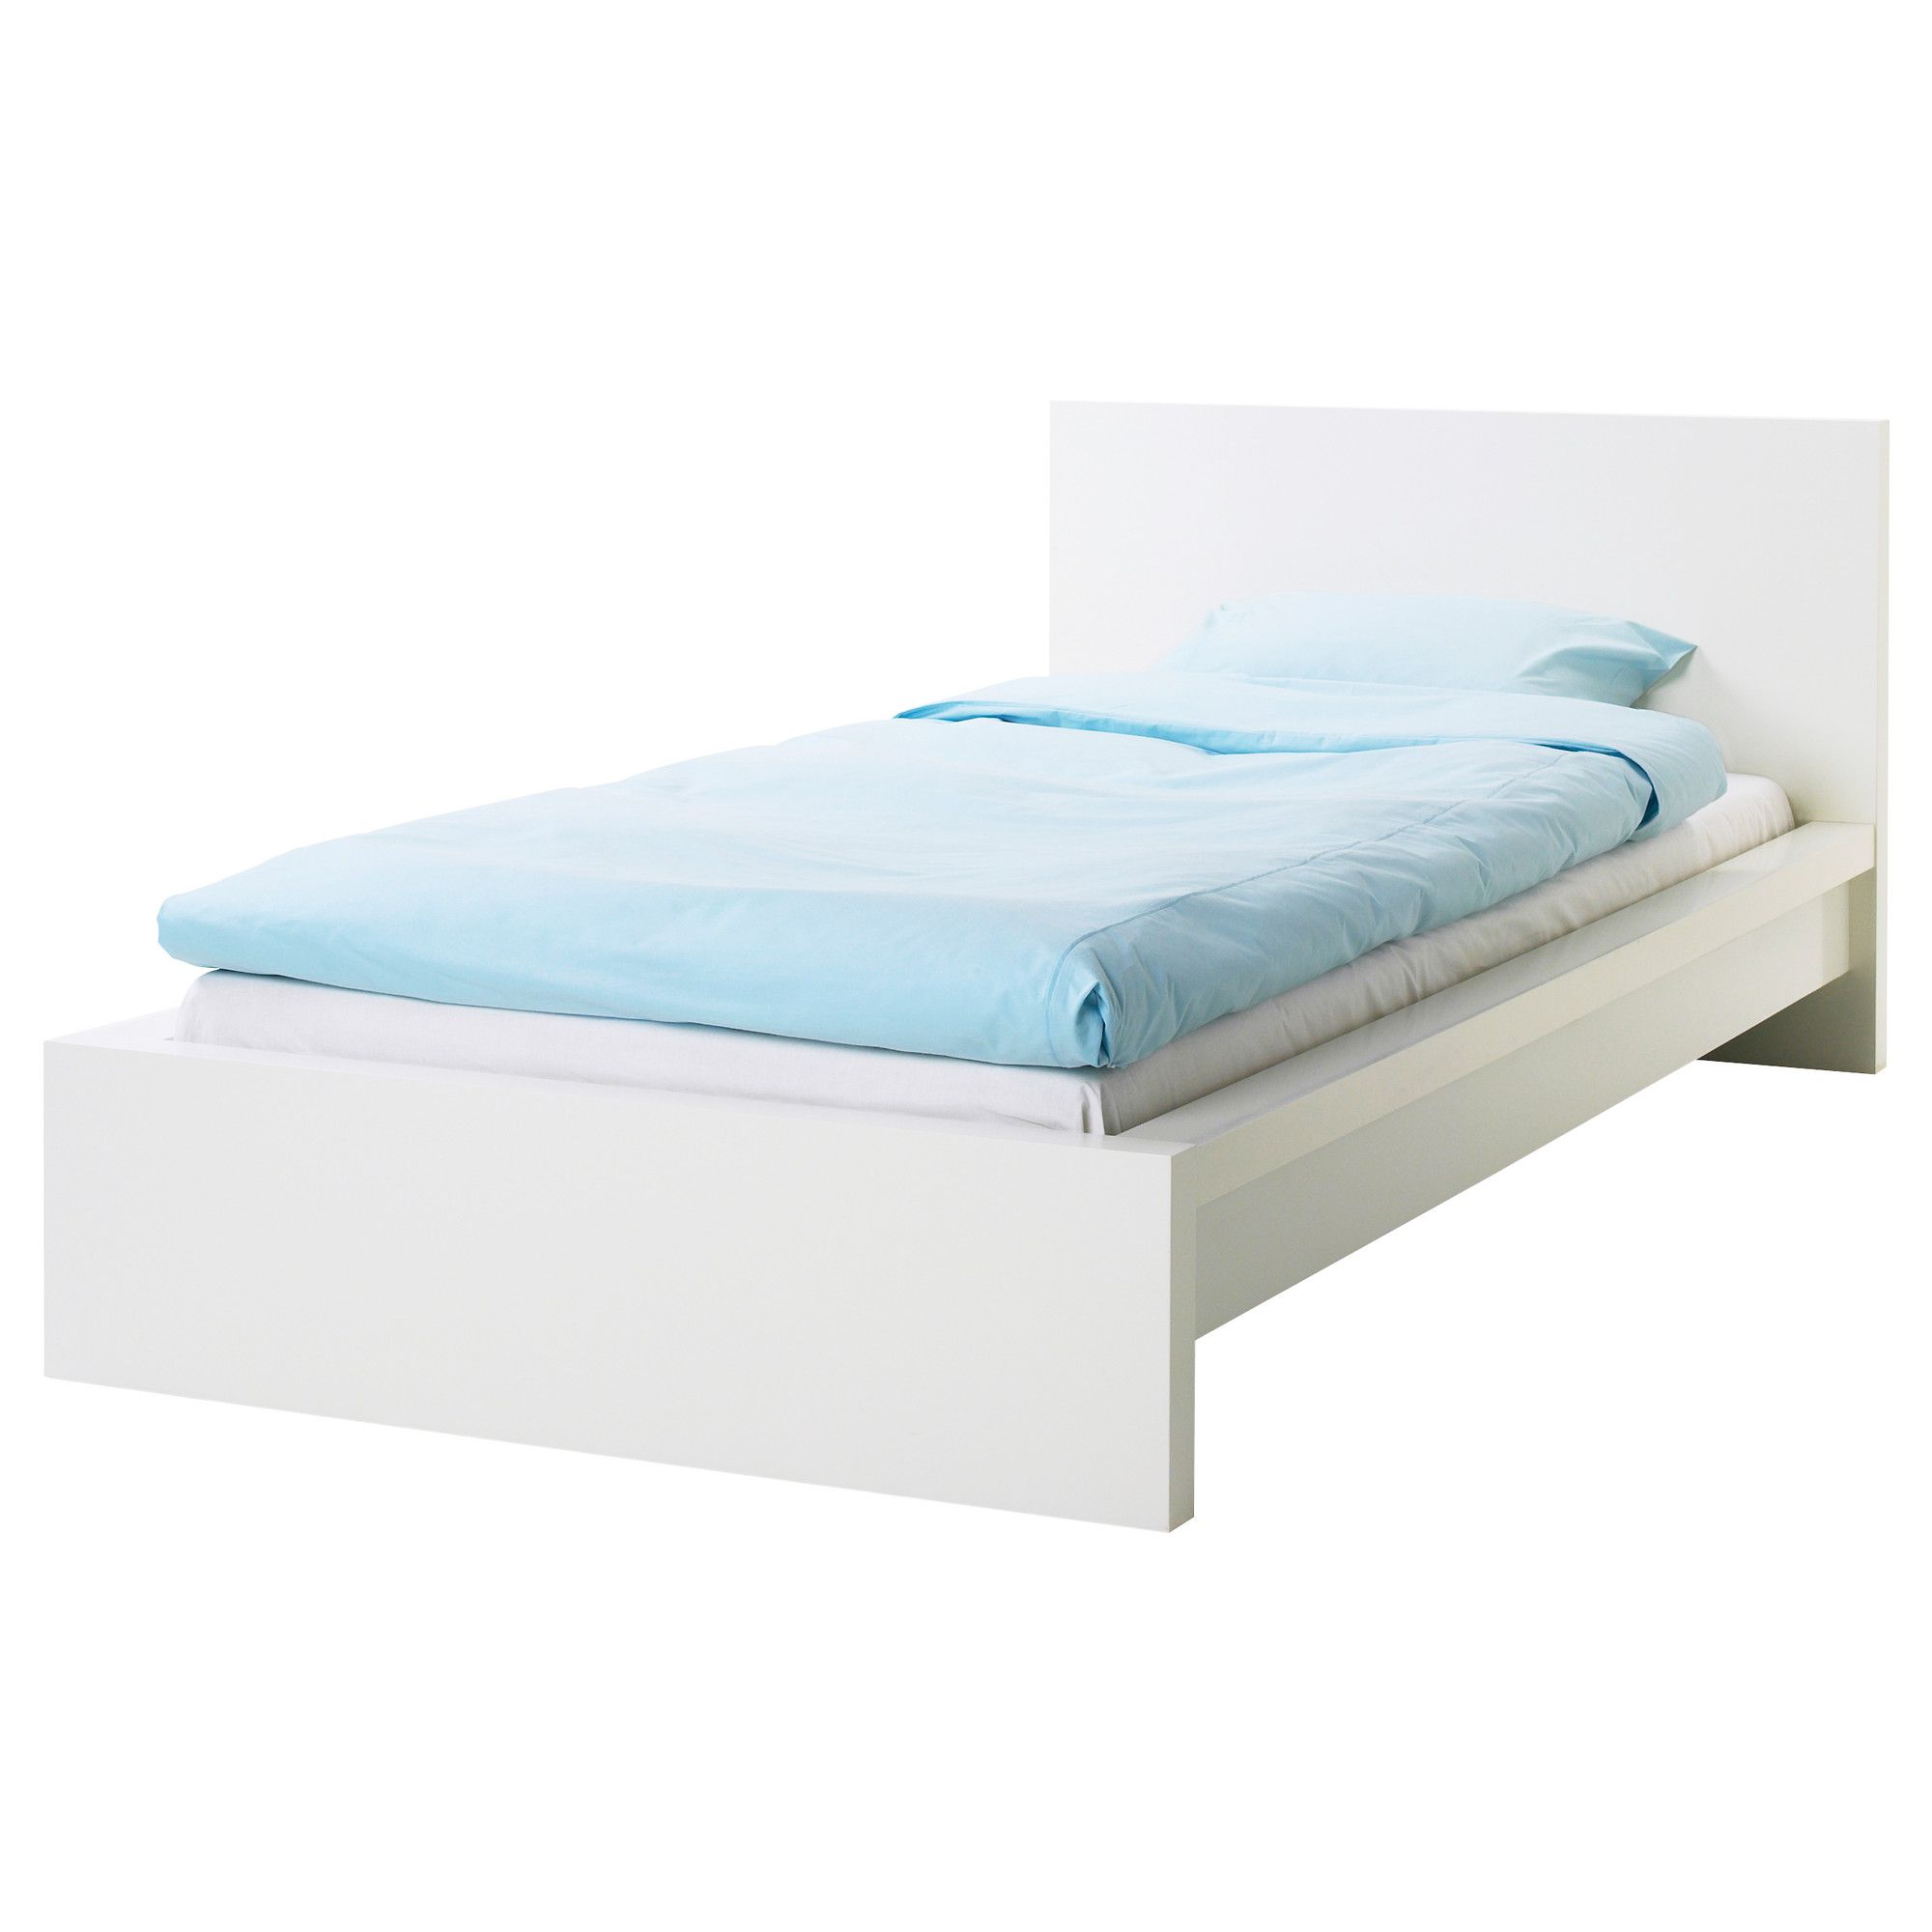 MALM Bed frame whiteLury IKEA Annabelles Bedroom